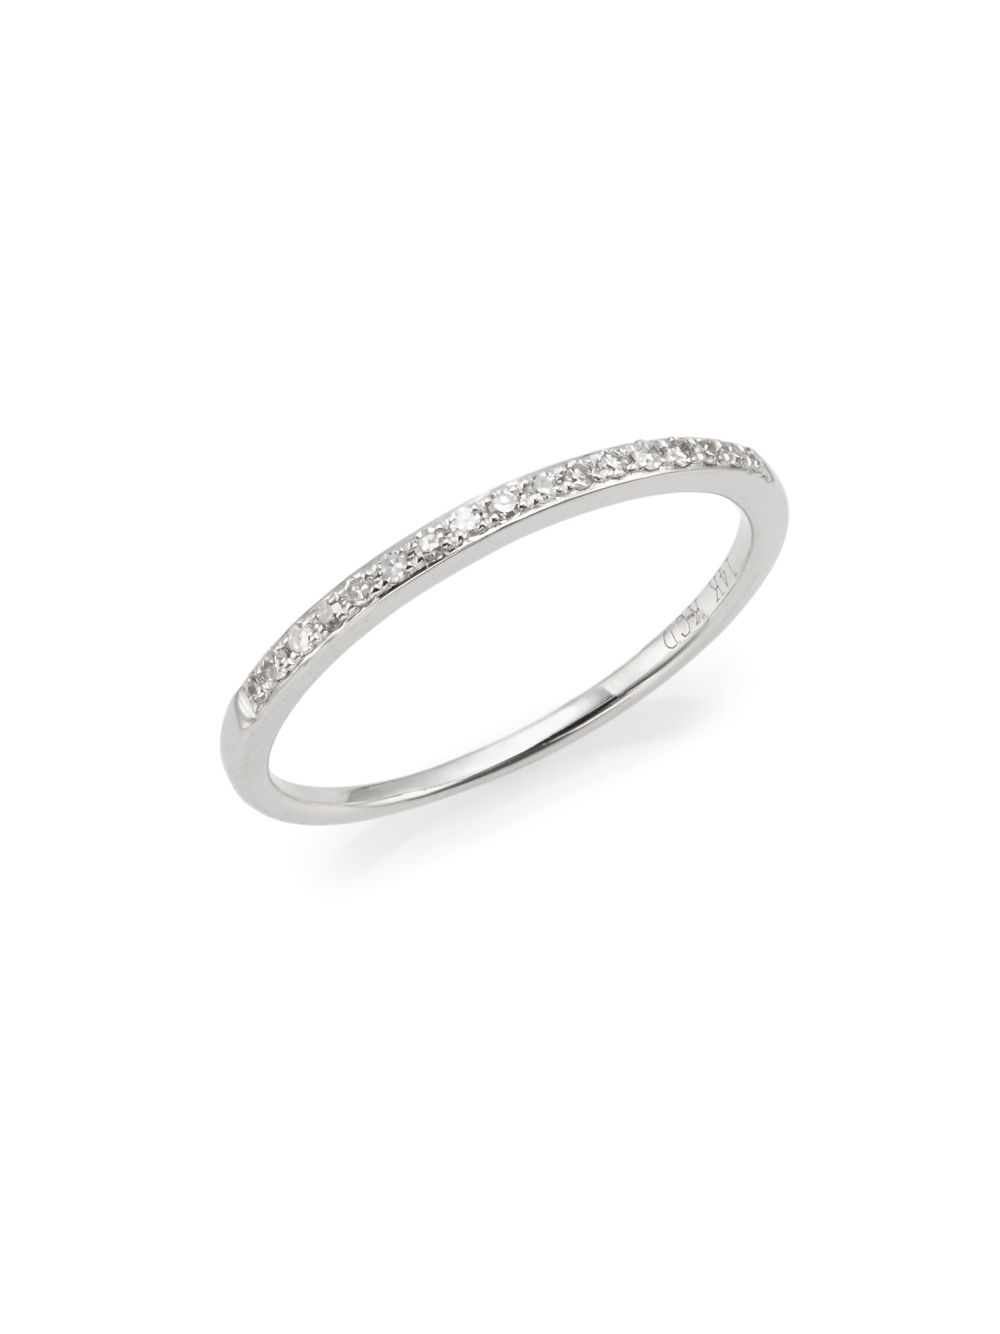 Lyst - Kc Designs Brilliant Diamond & 14k White Gold Midi Ring in ...